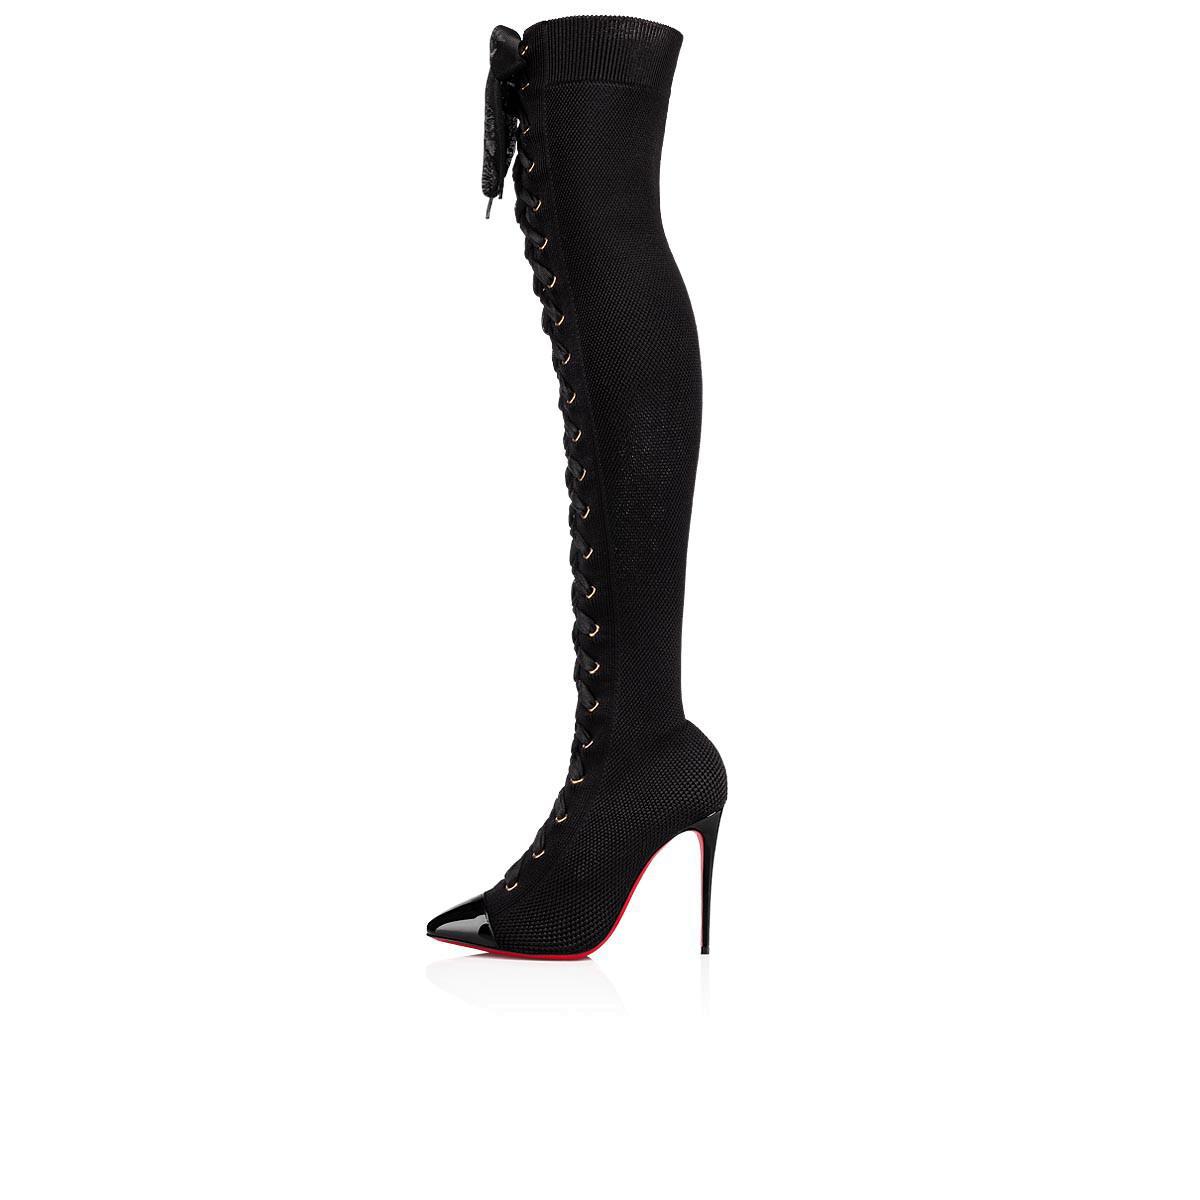 ... germany christian louboutin black frenchie boot lyst. view fullscreen  69e0b acc61 ... 835e518da